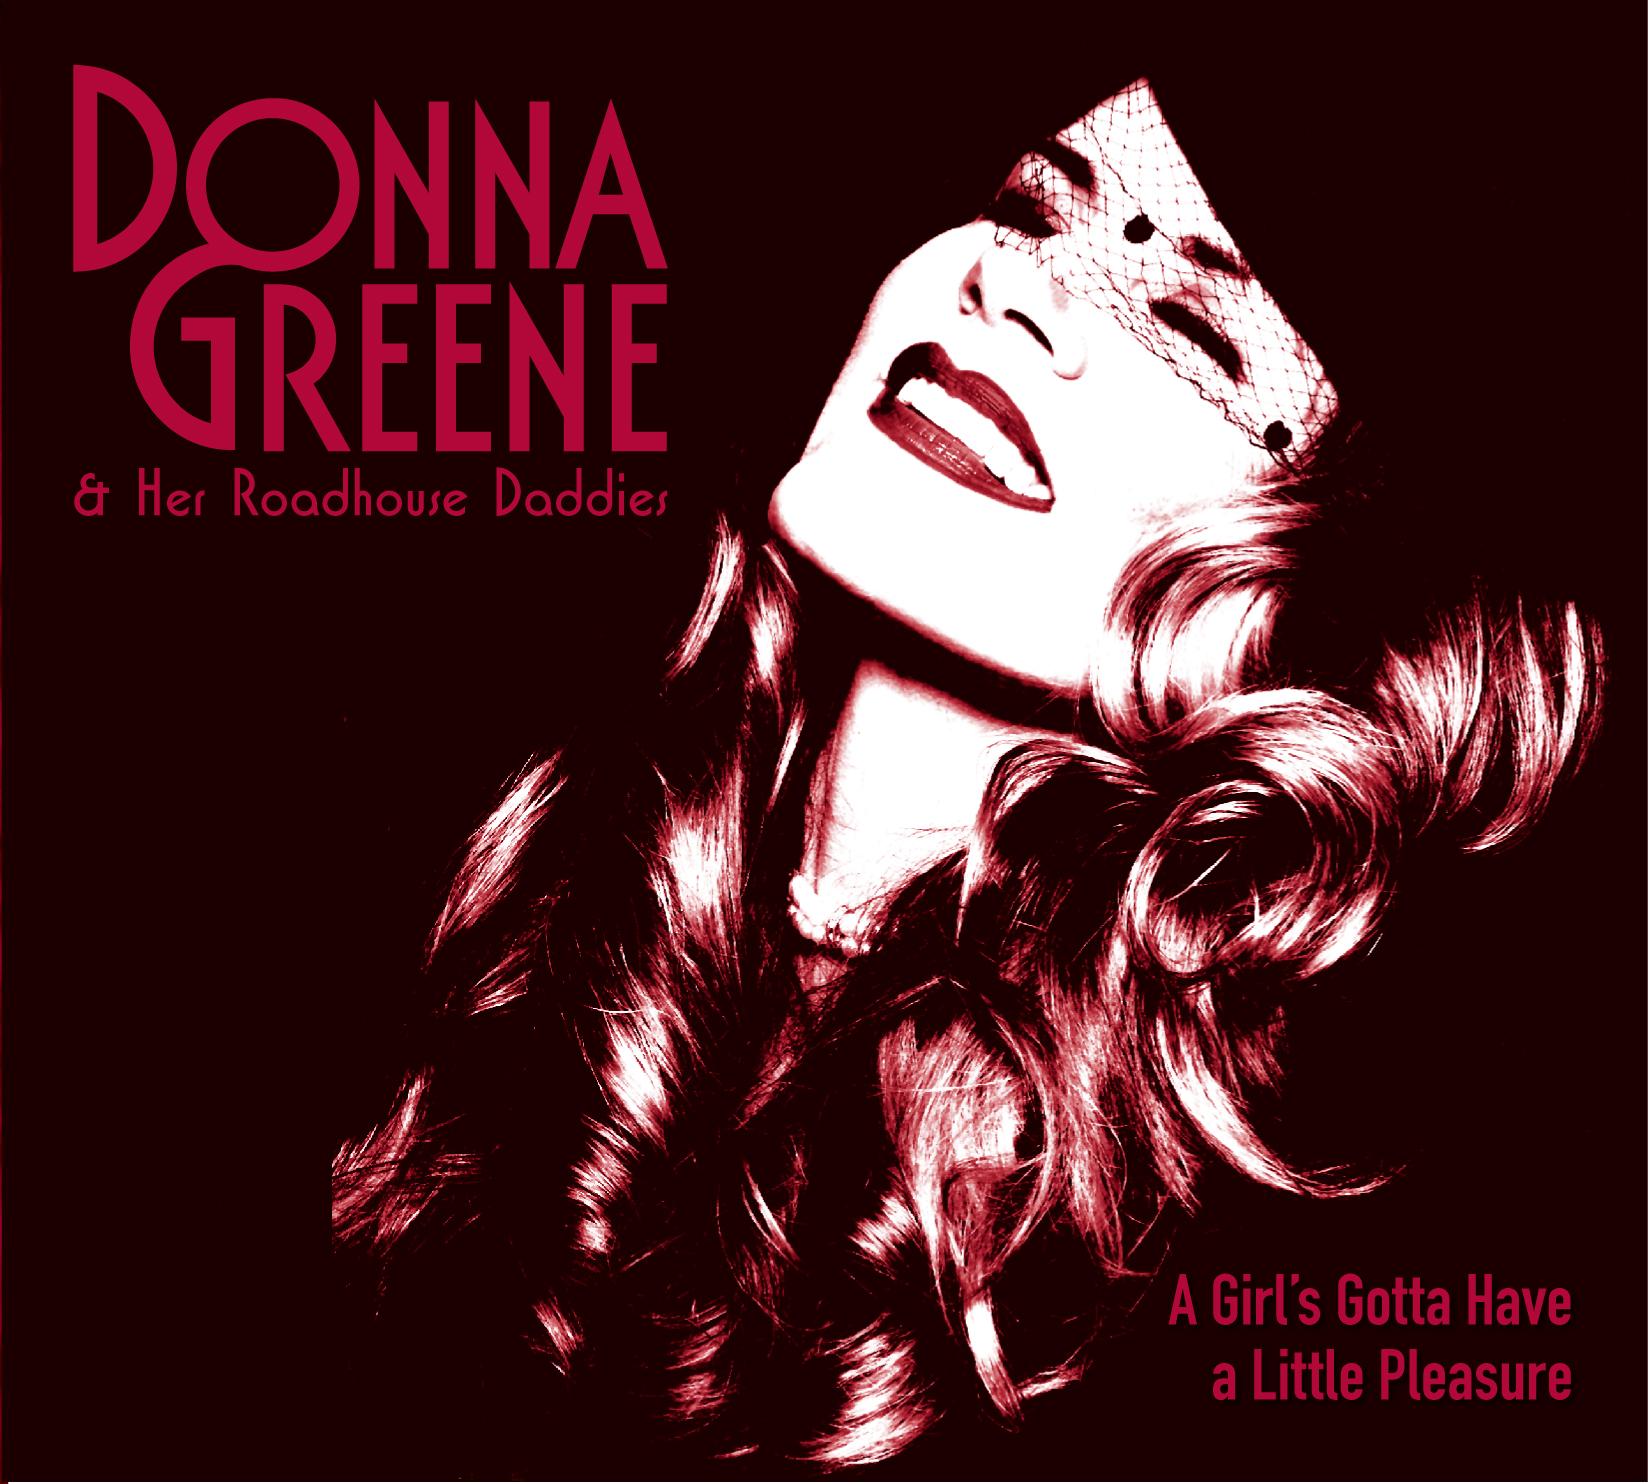 Donna Greene & the Roadhouse Daddies, a Girl's Gotta Have a Little Pleasure